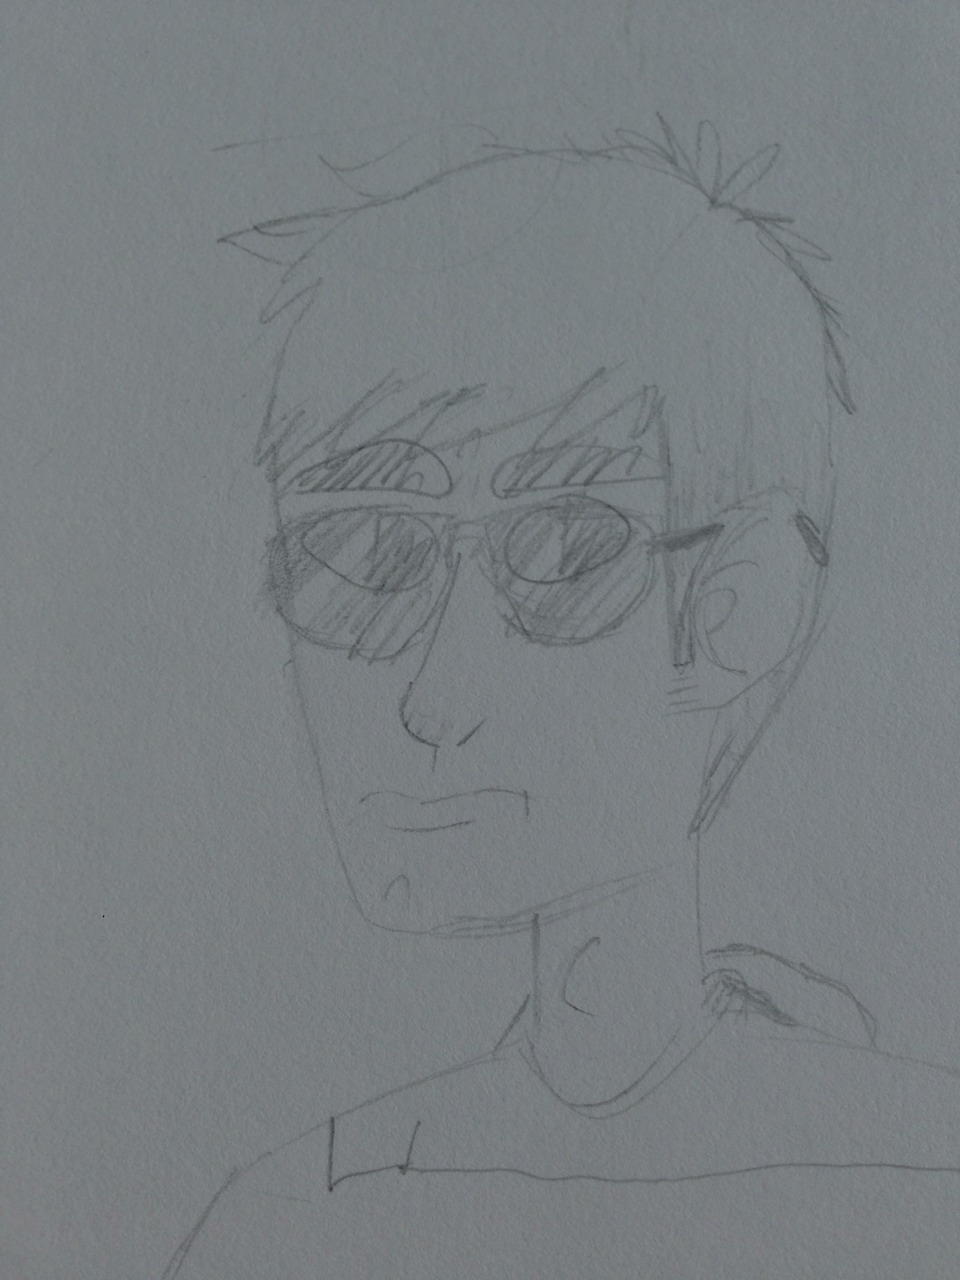 Dave Strider doodle by Omomon